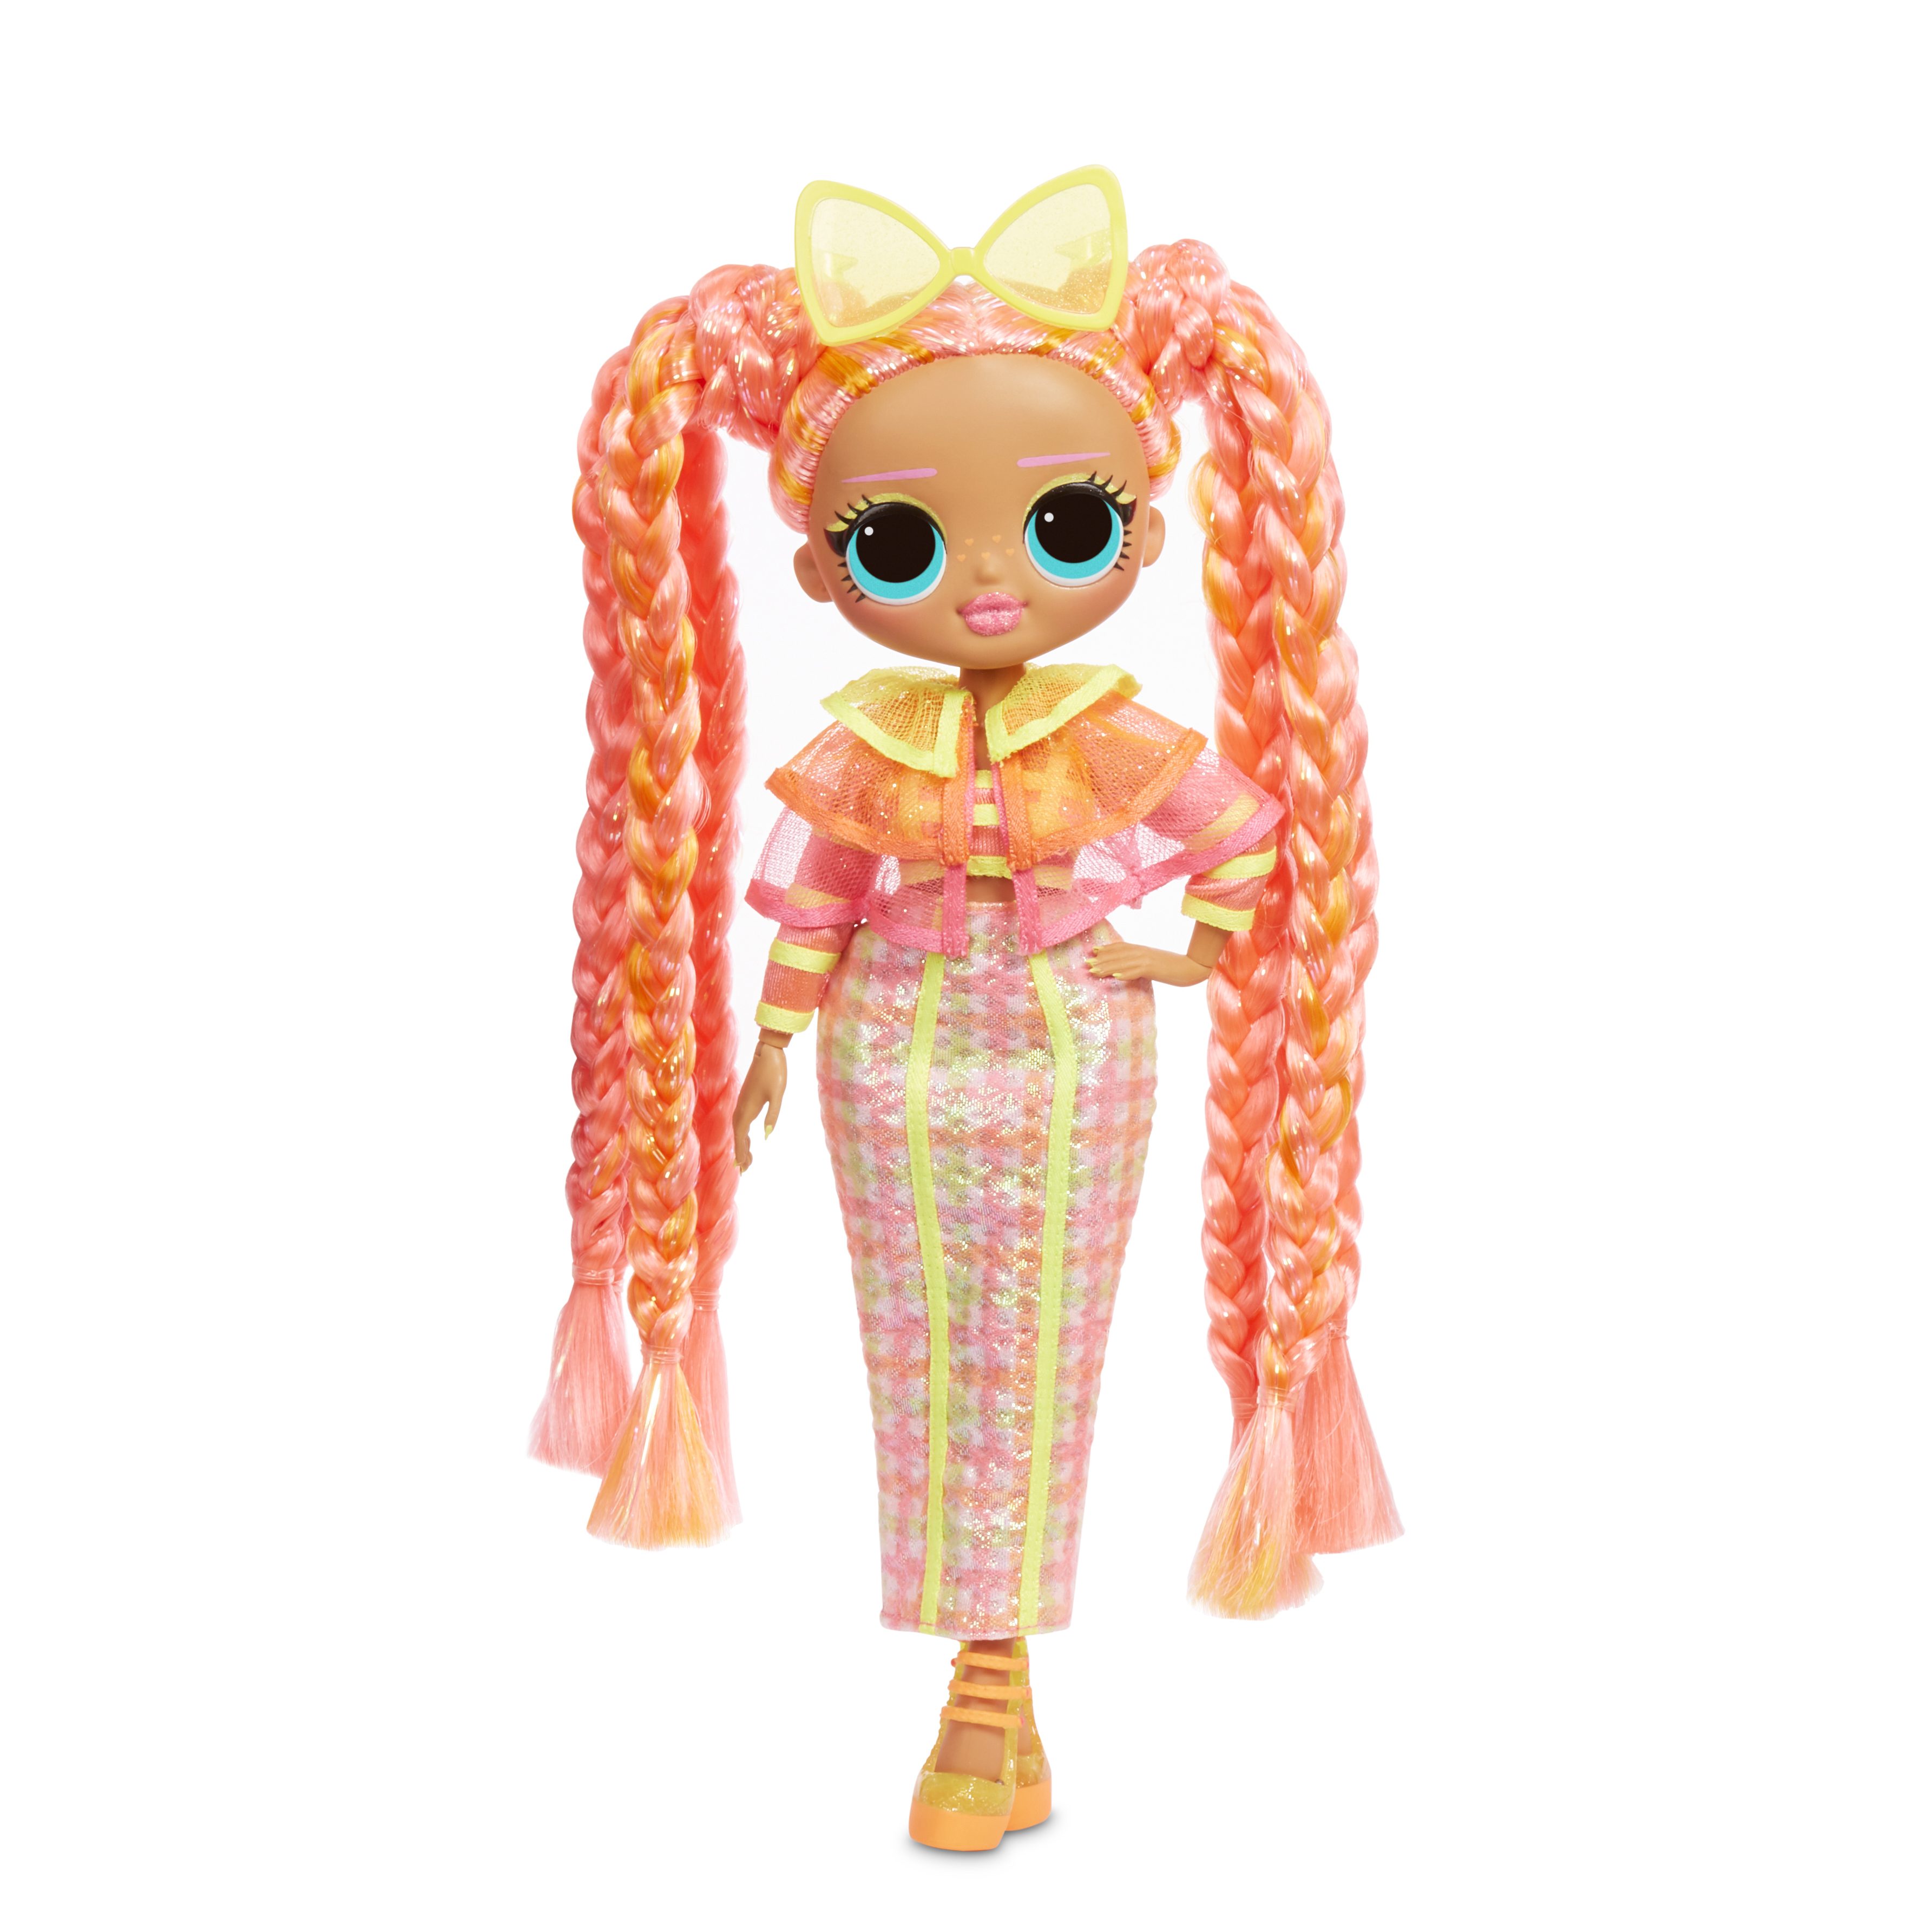 L.O.L. Surprise 565185 Кукла OMG серия Неон Dazzle